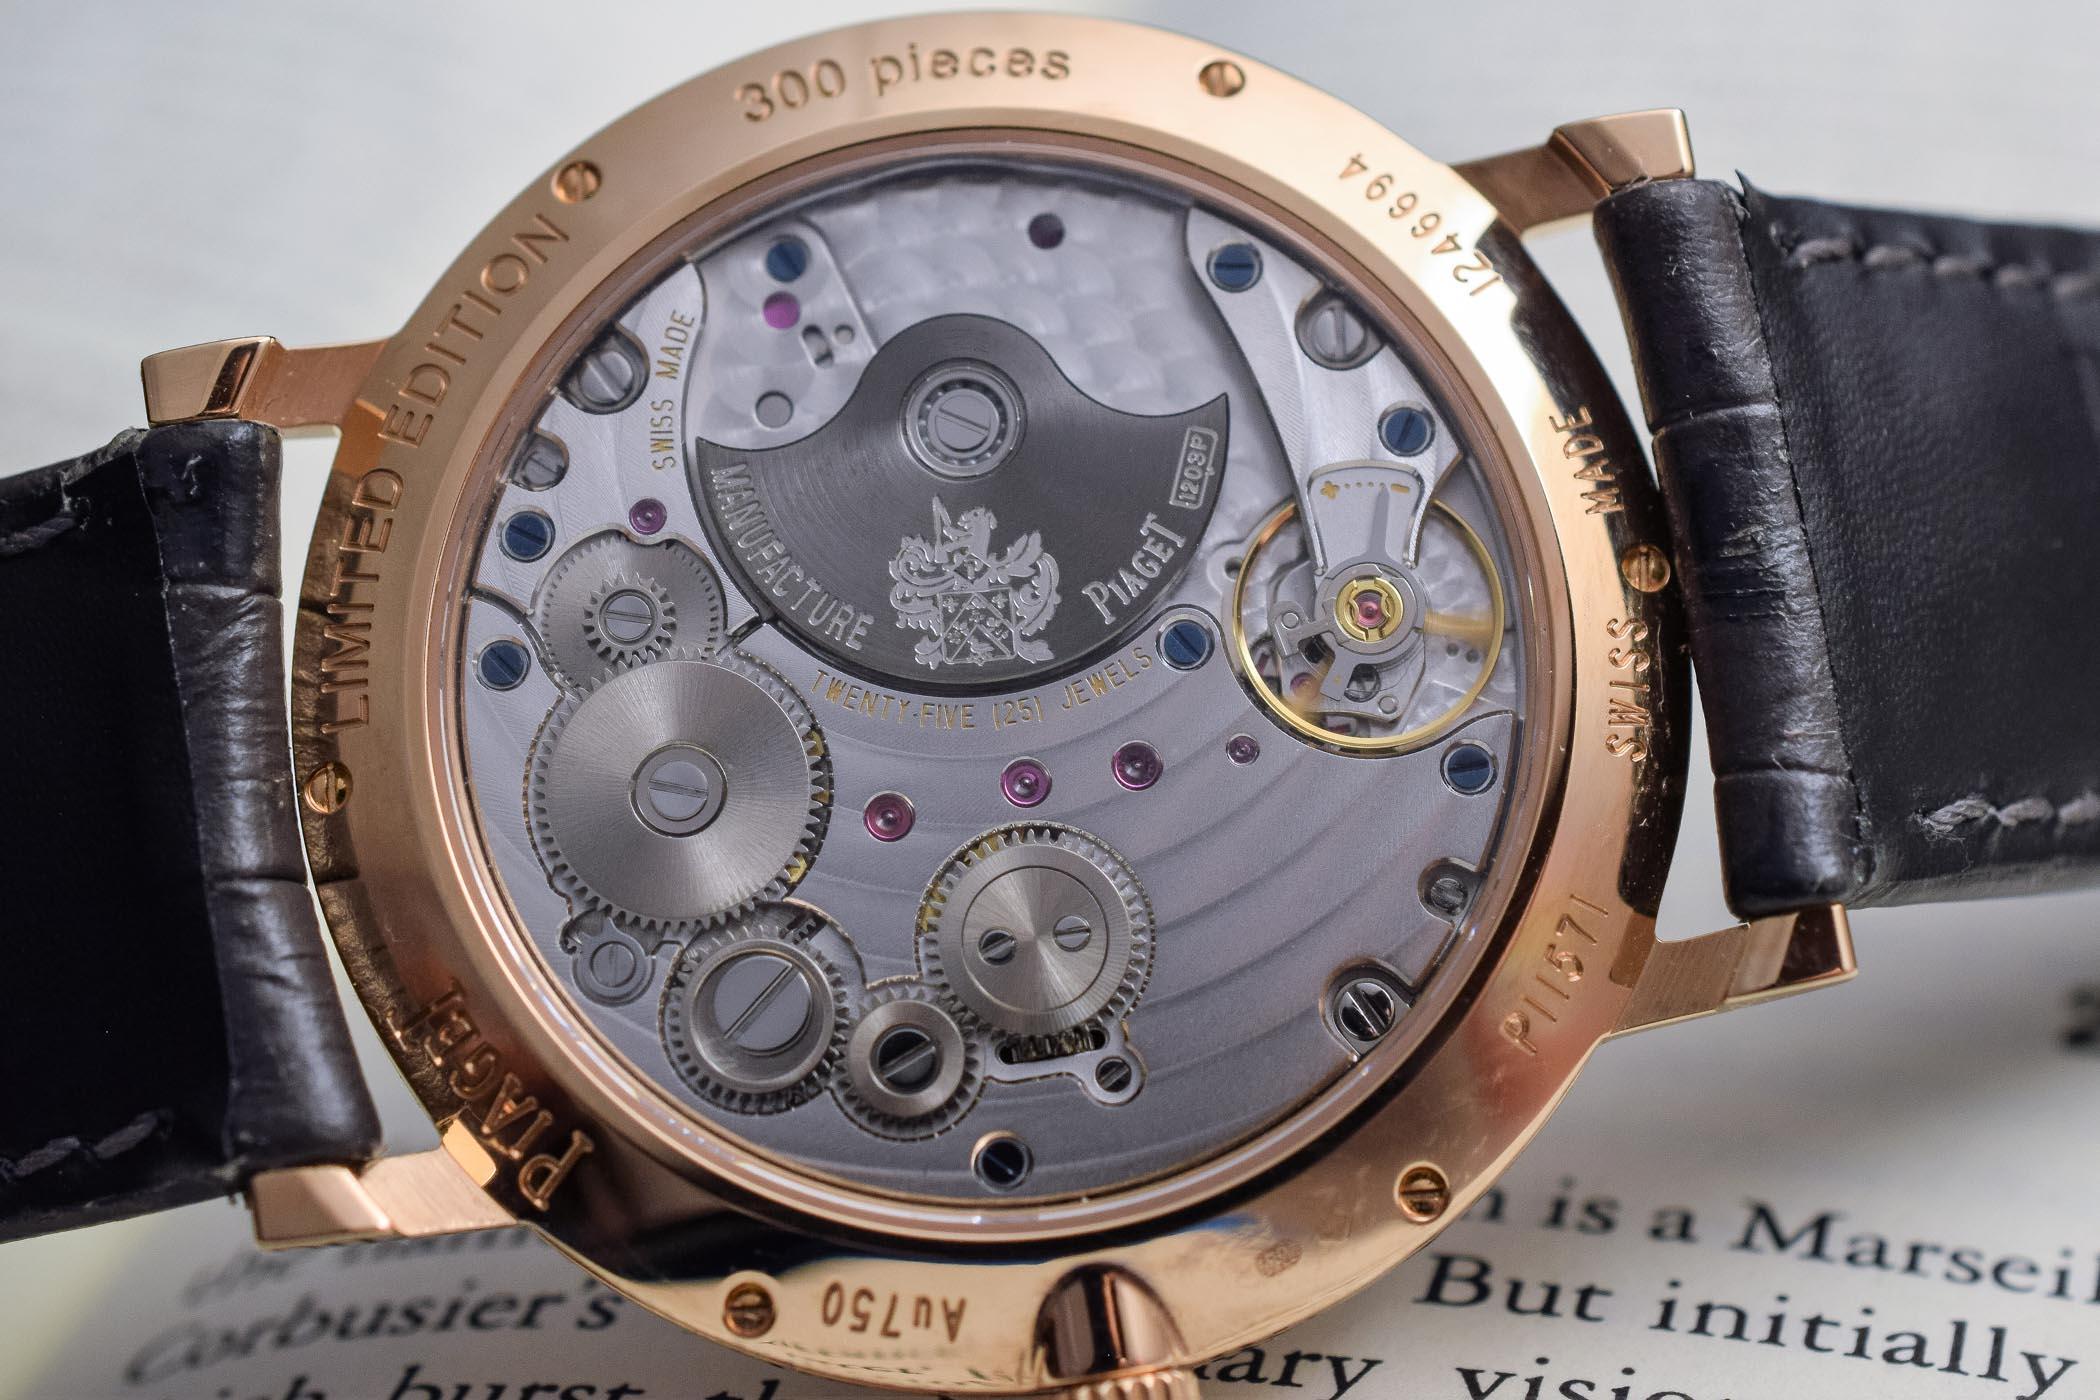 Piaget Altiplano 40mm pink gold Grey meteorite dial - SIHH 2019 - 4